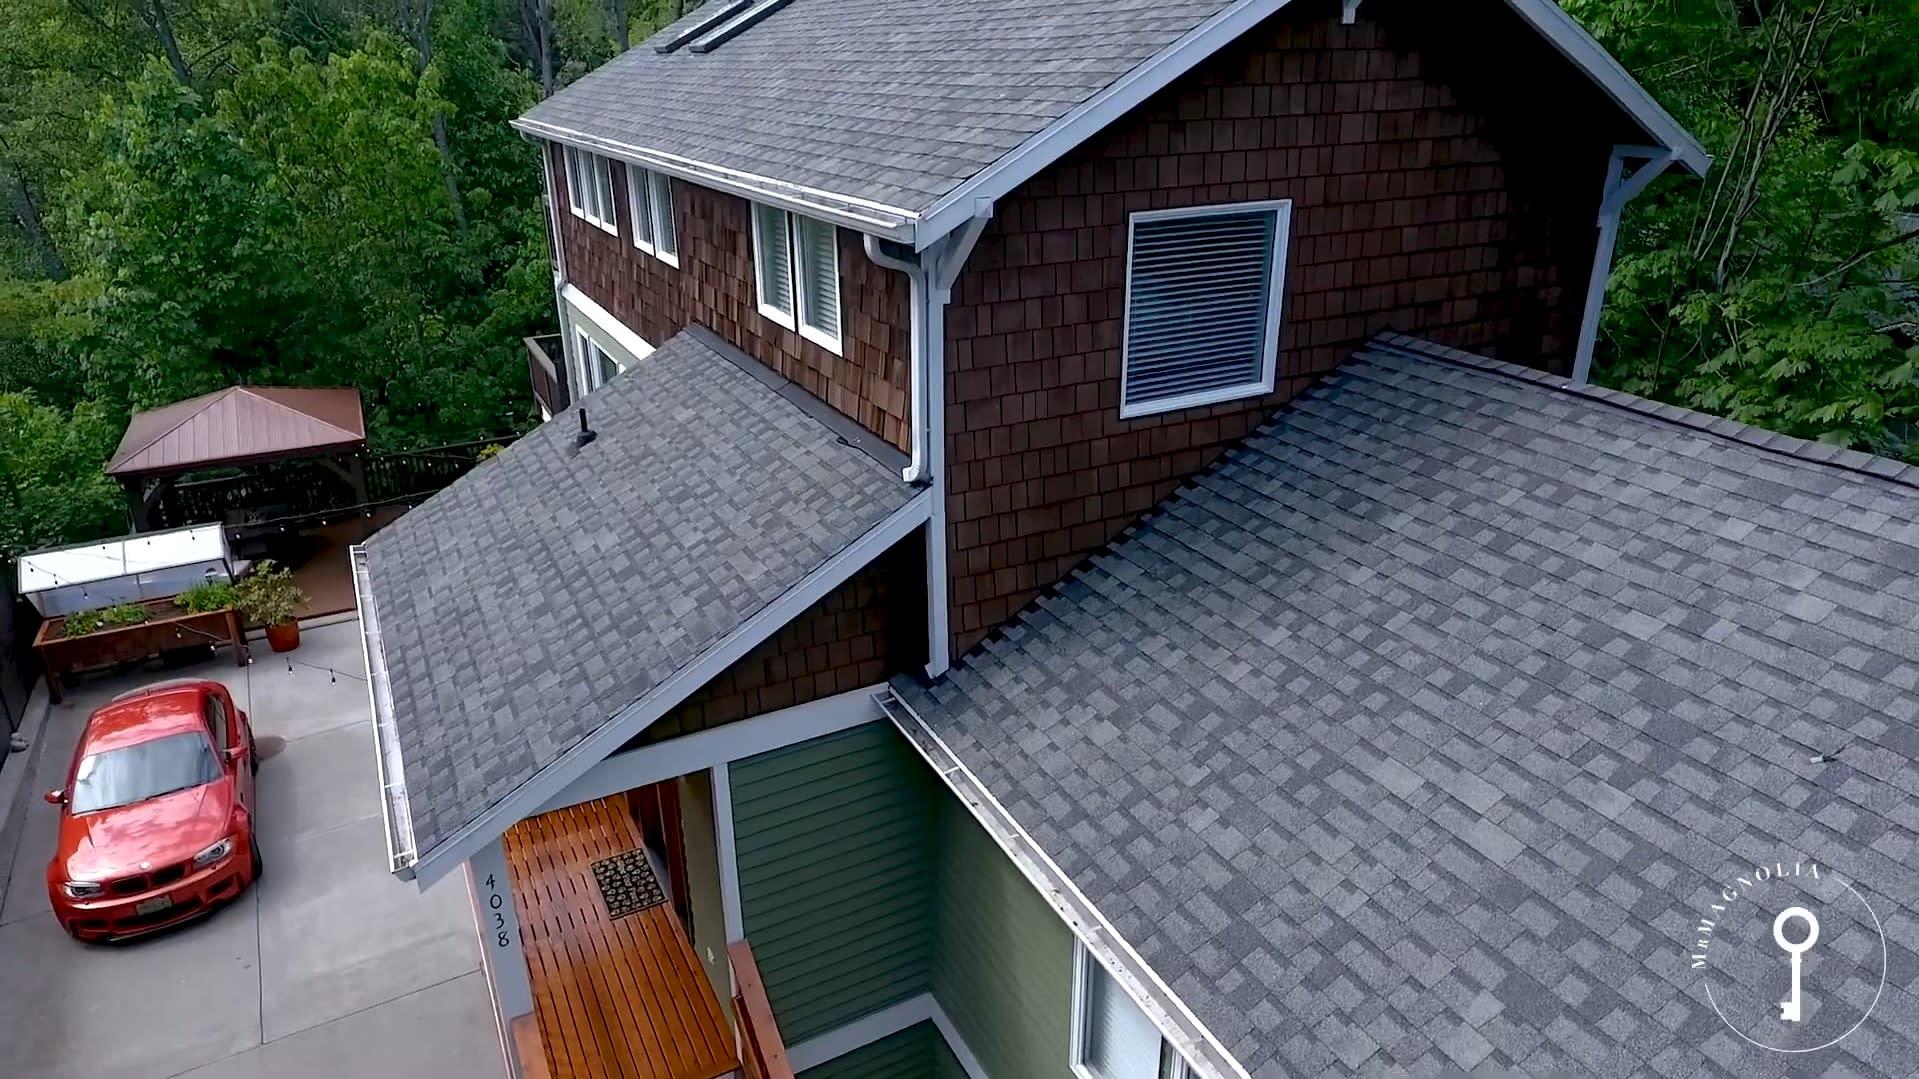 4038 35th Avenue W - Seattle, WA video preview